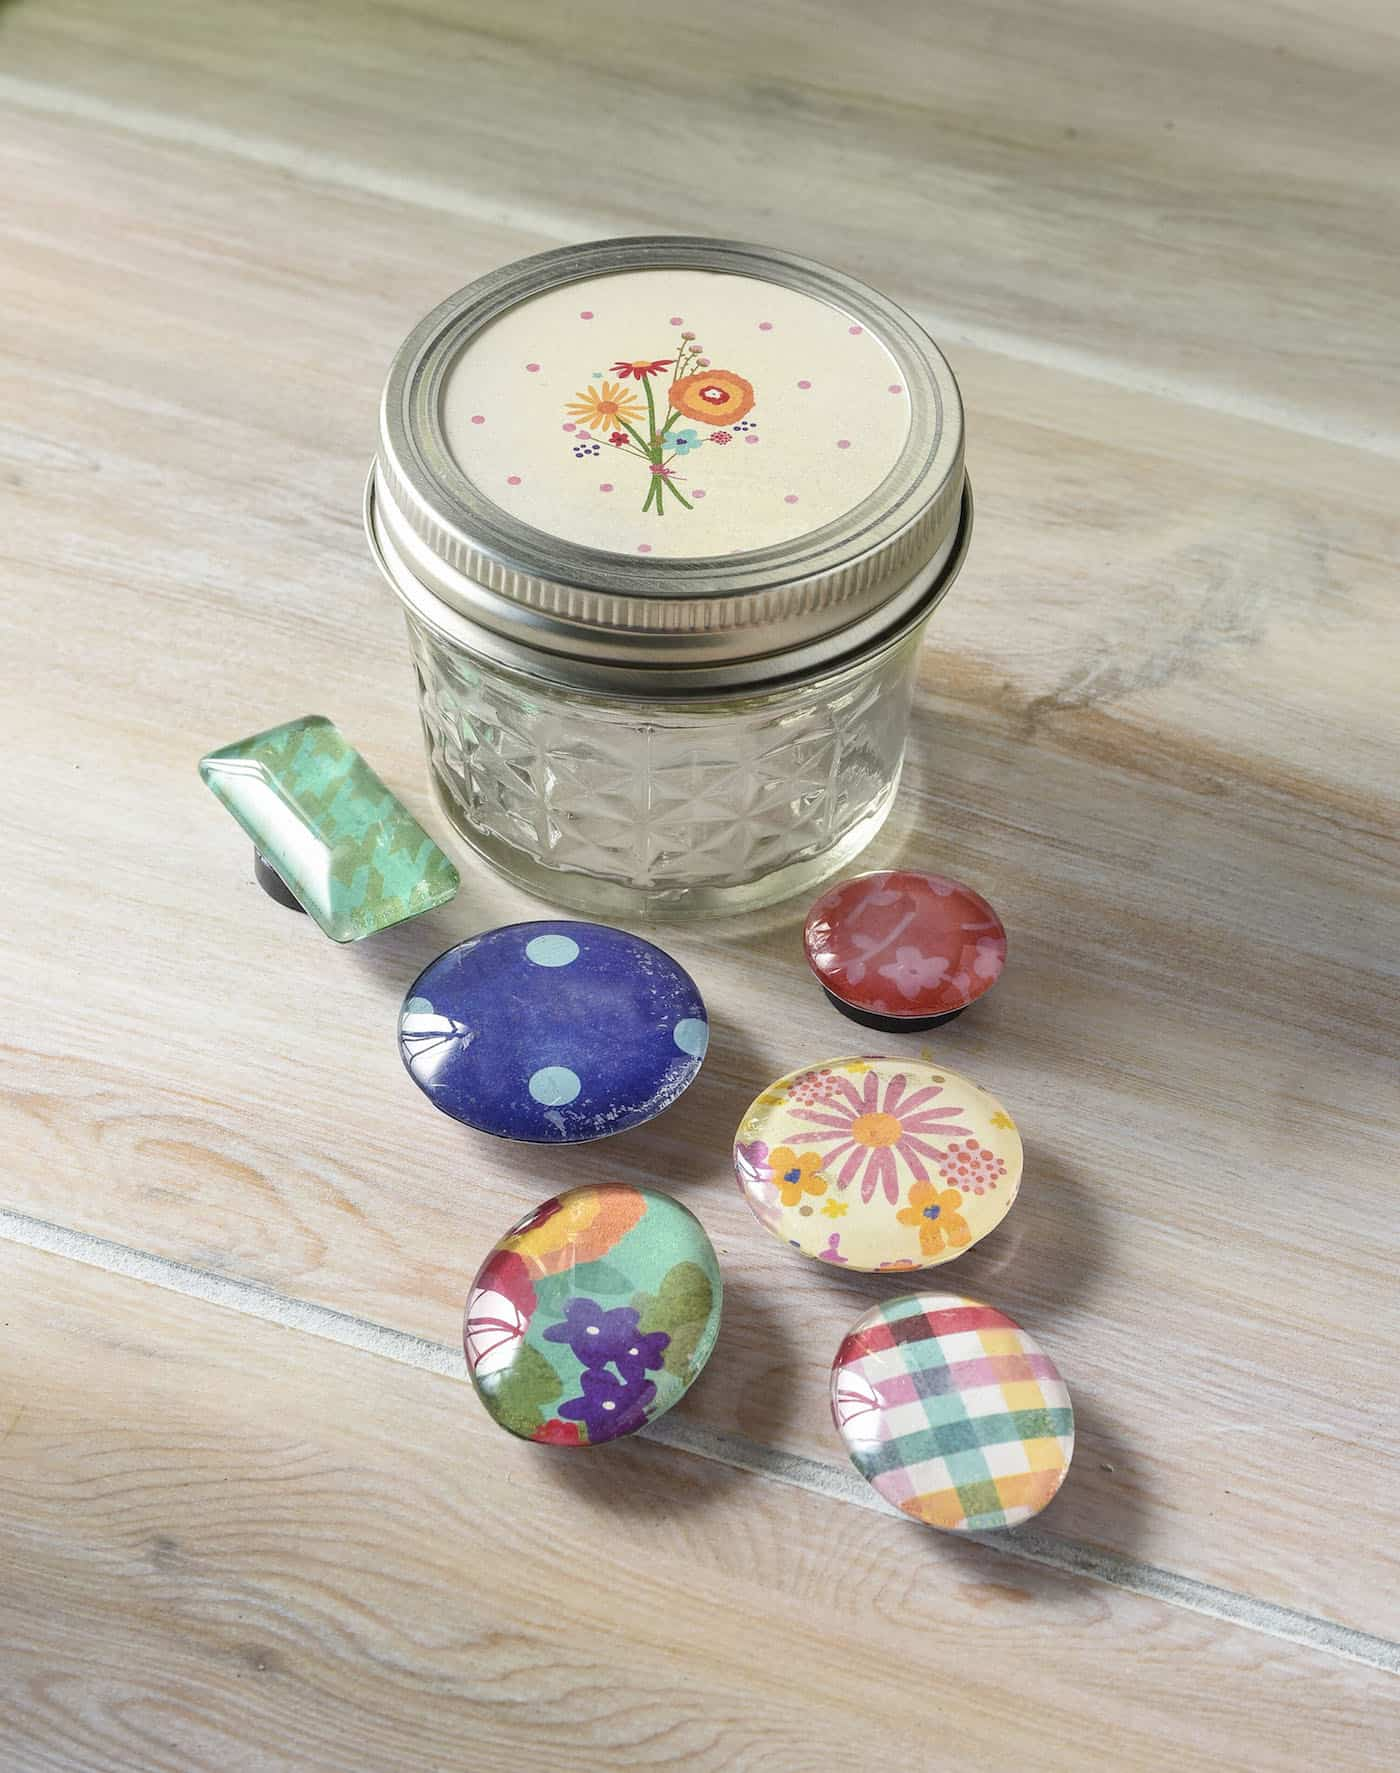 Quick handmade gifts: DIY magnets in a mason jar - Mod ...